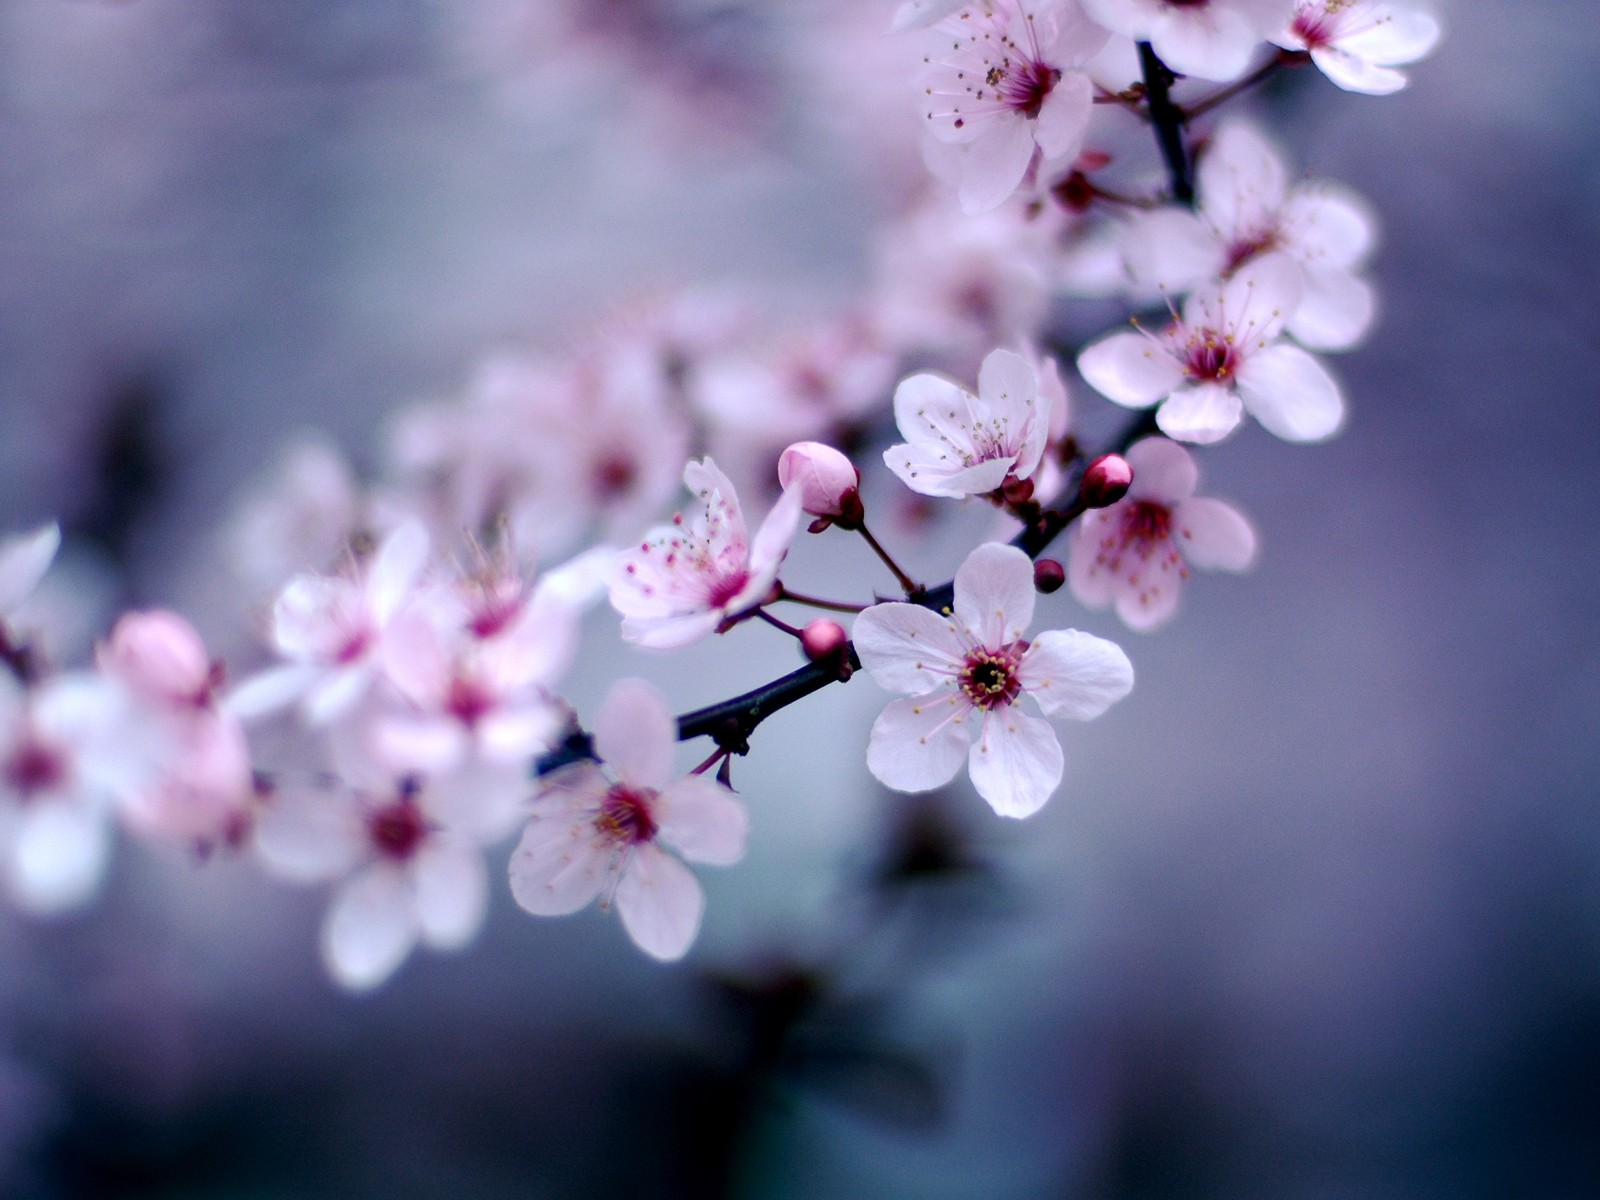 Cherry Blossom Desktop Wallpaper Preview wallcapernet 1600x1200